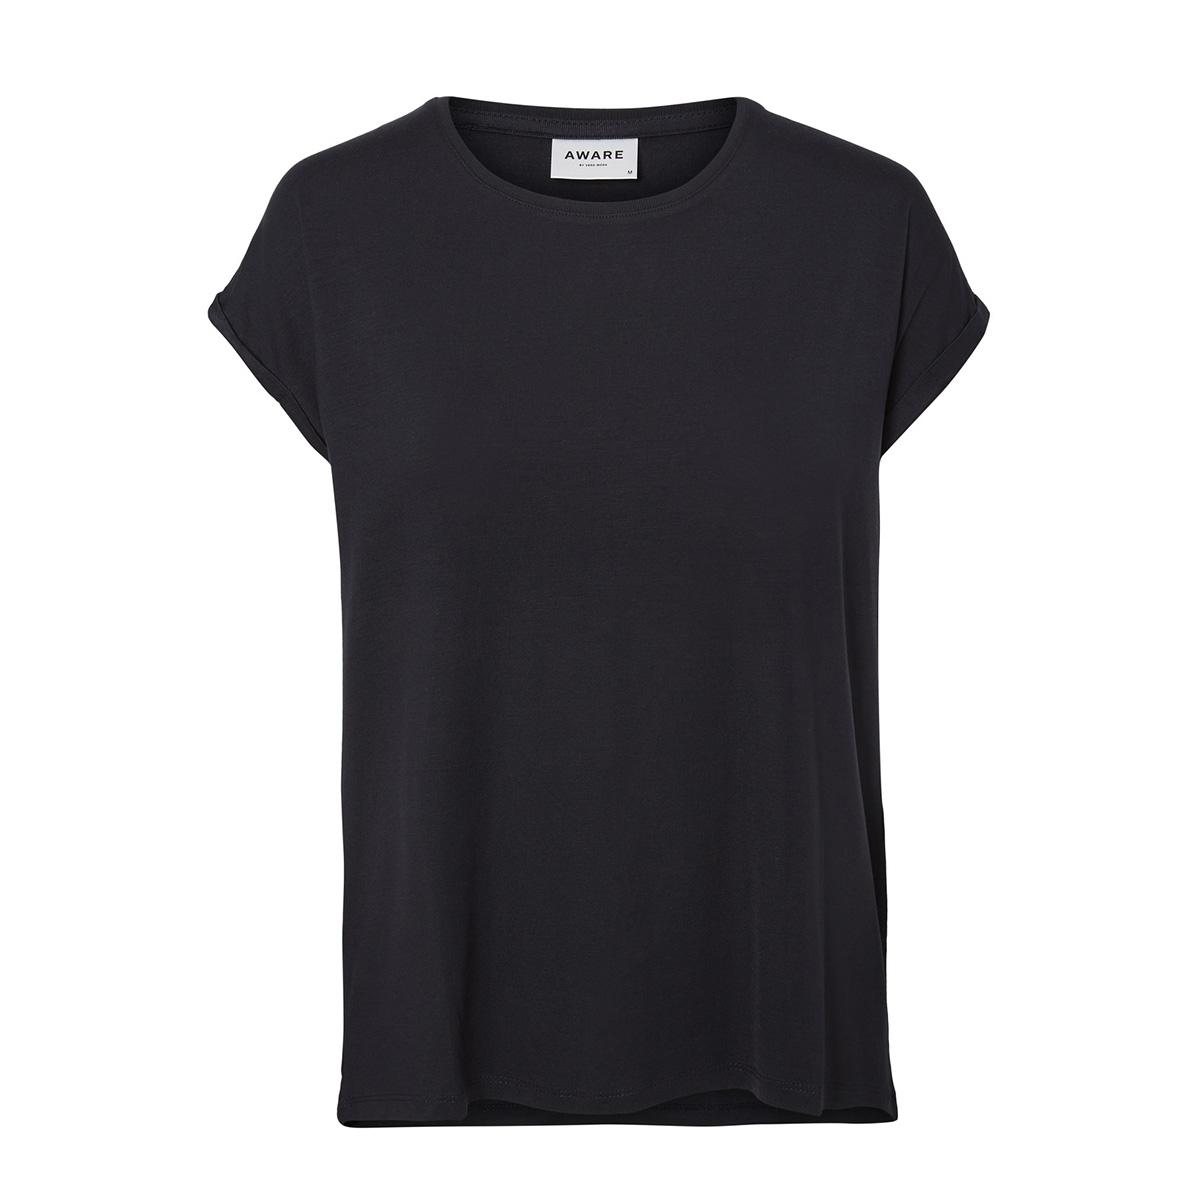 vmava plain ss top ga noos 10187159 vero moda t-shirt night sky